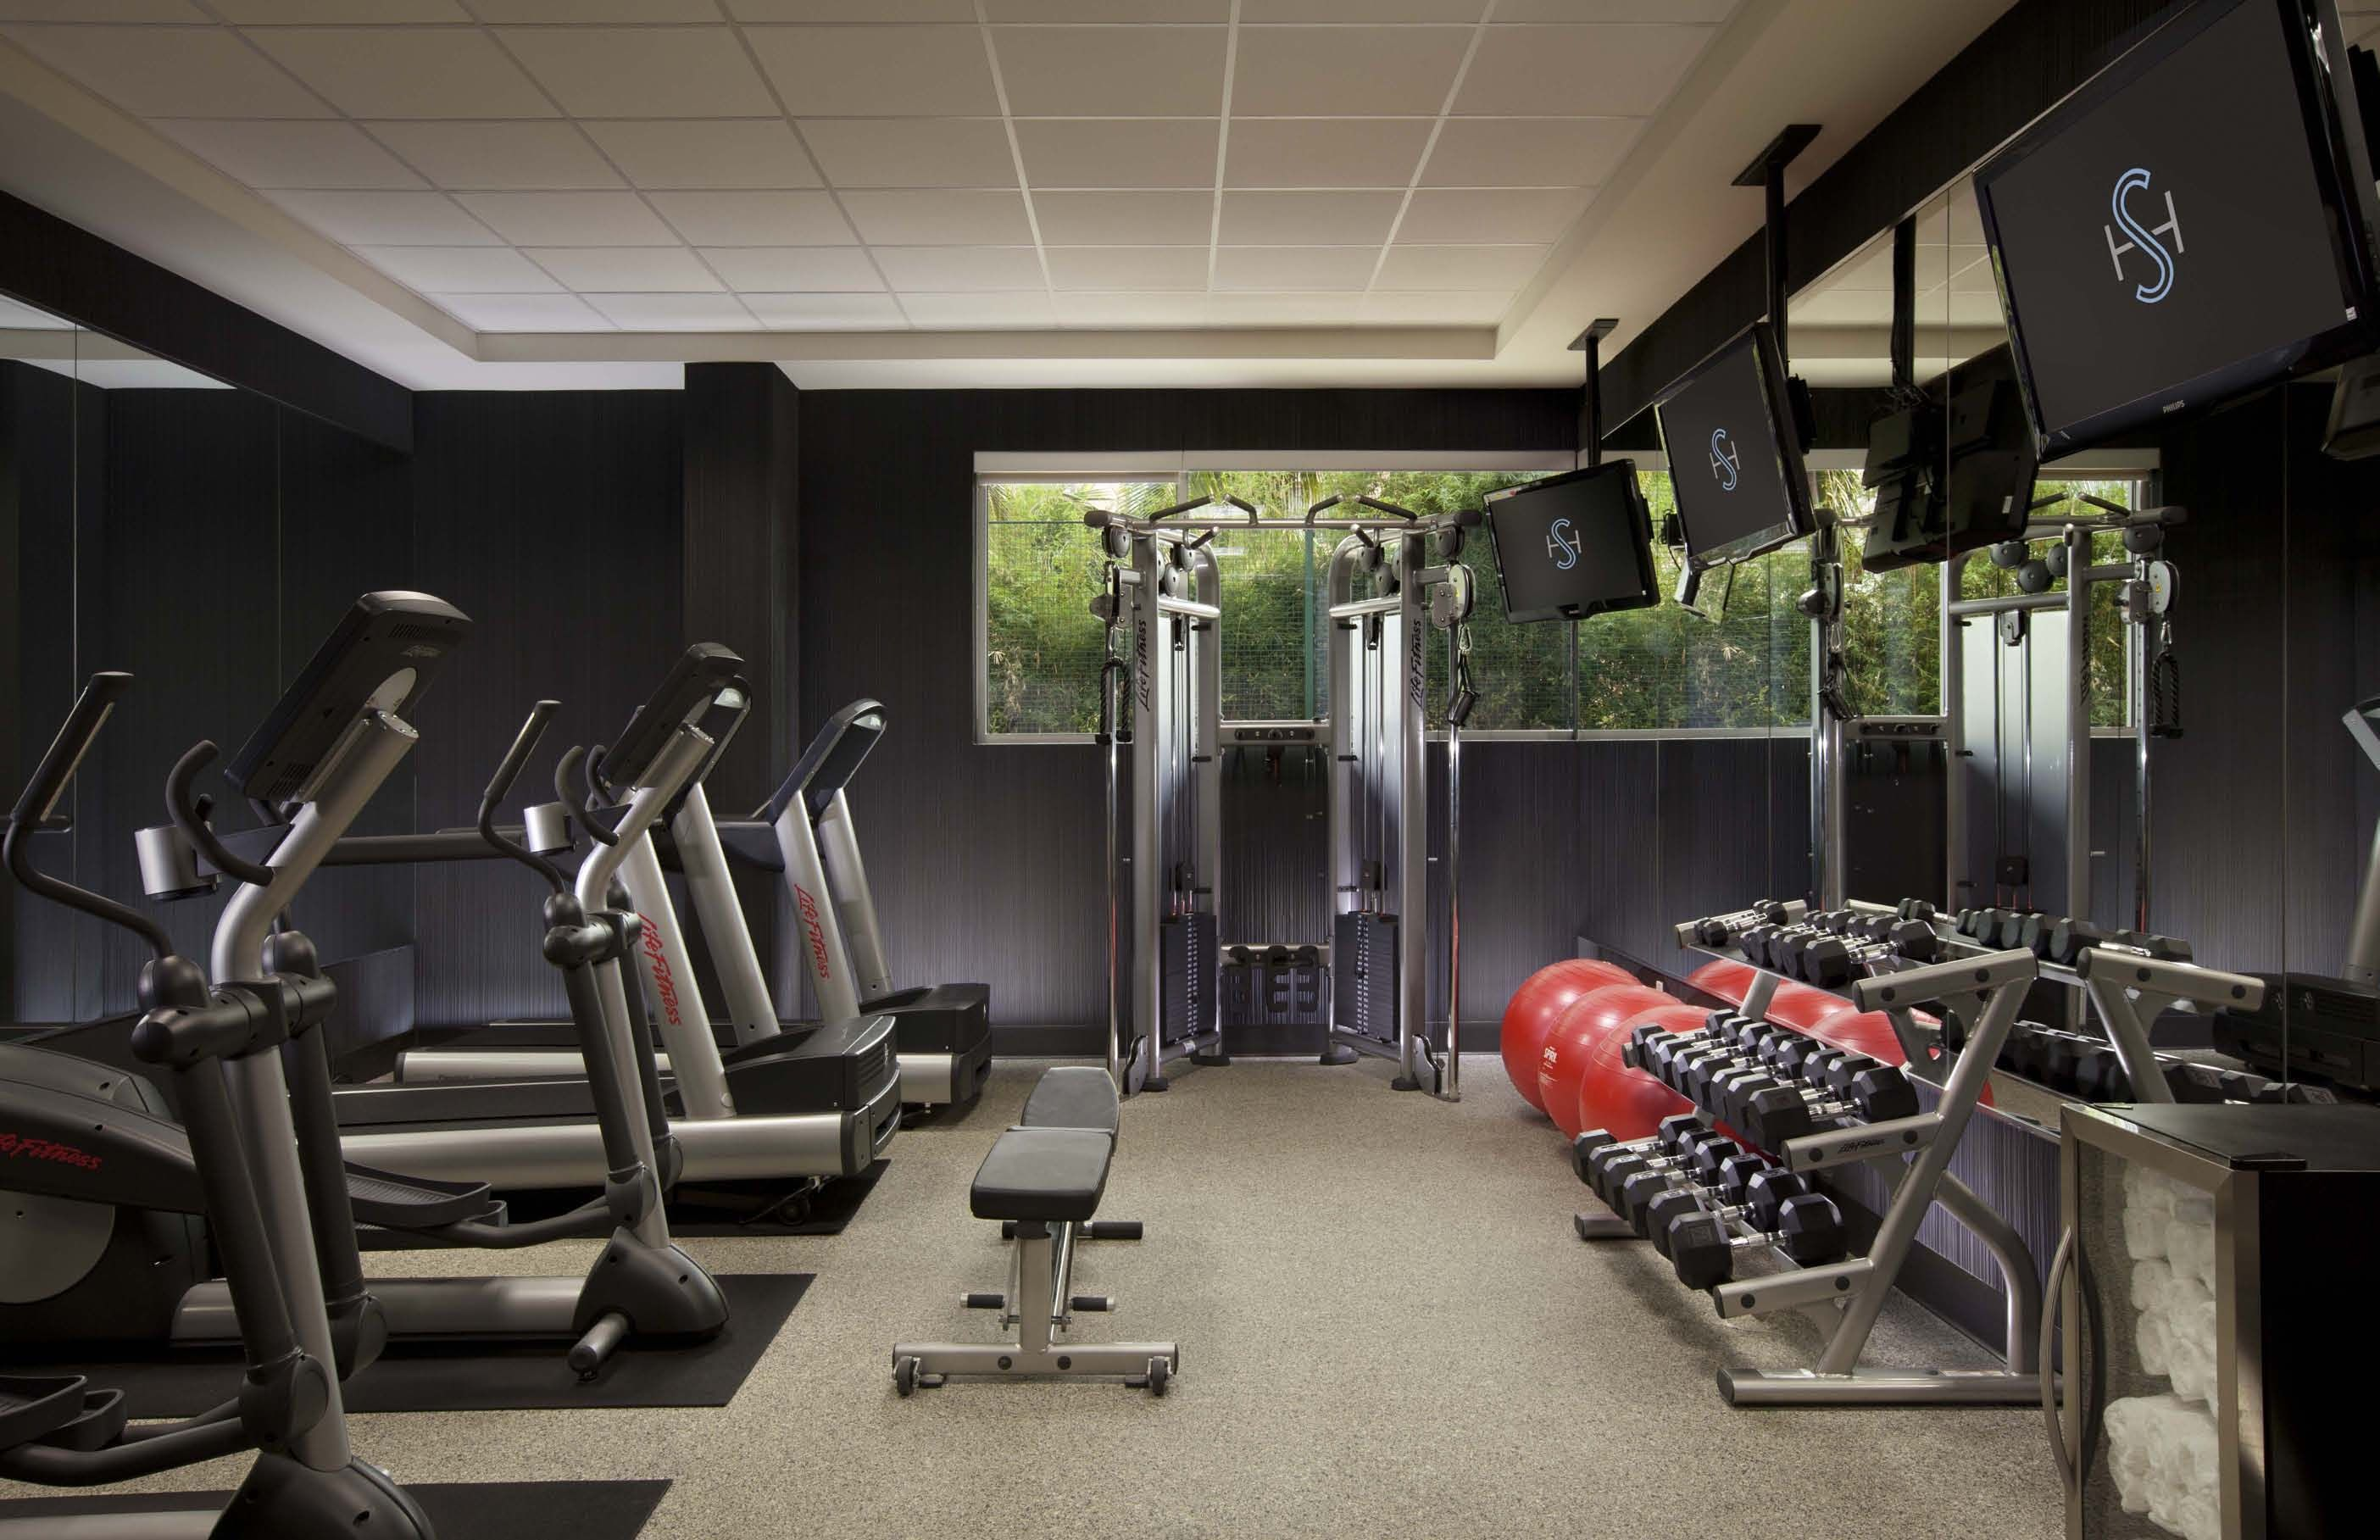 Fitness Center Luxury Gym Hotel Gym Room